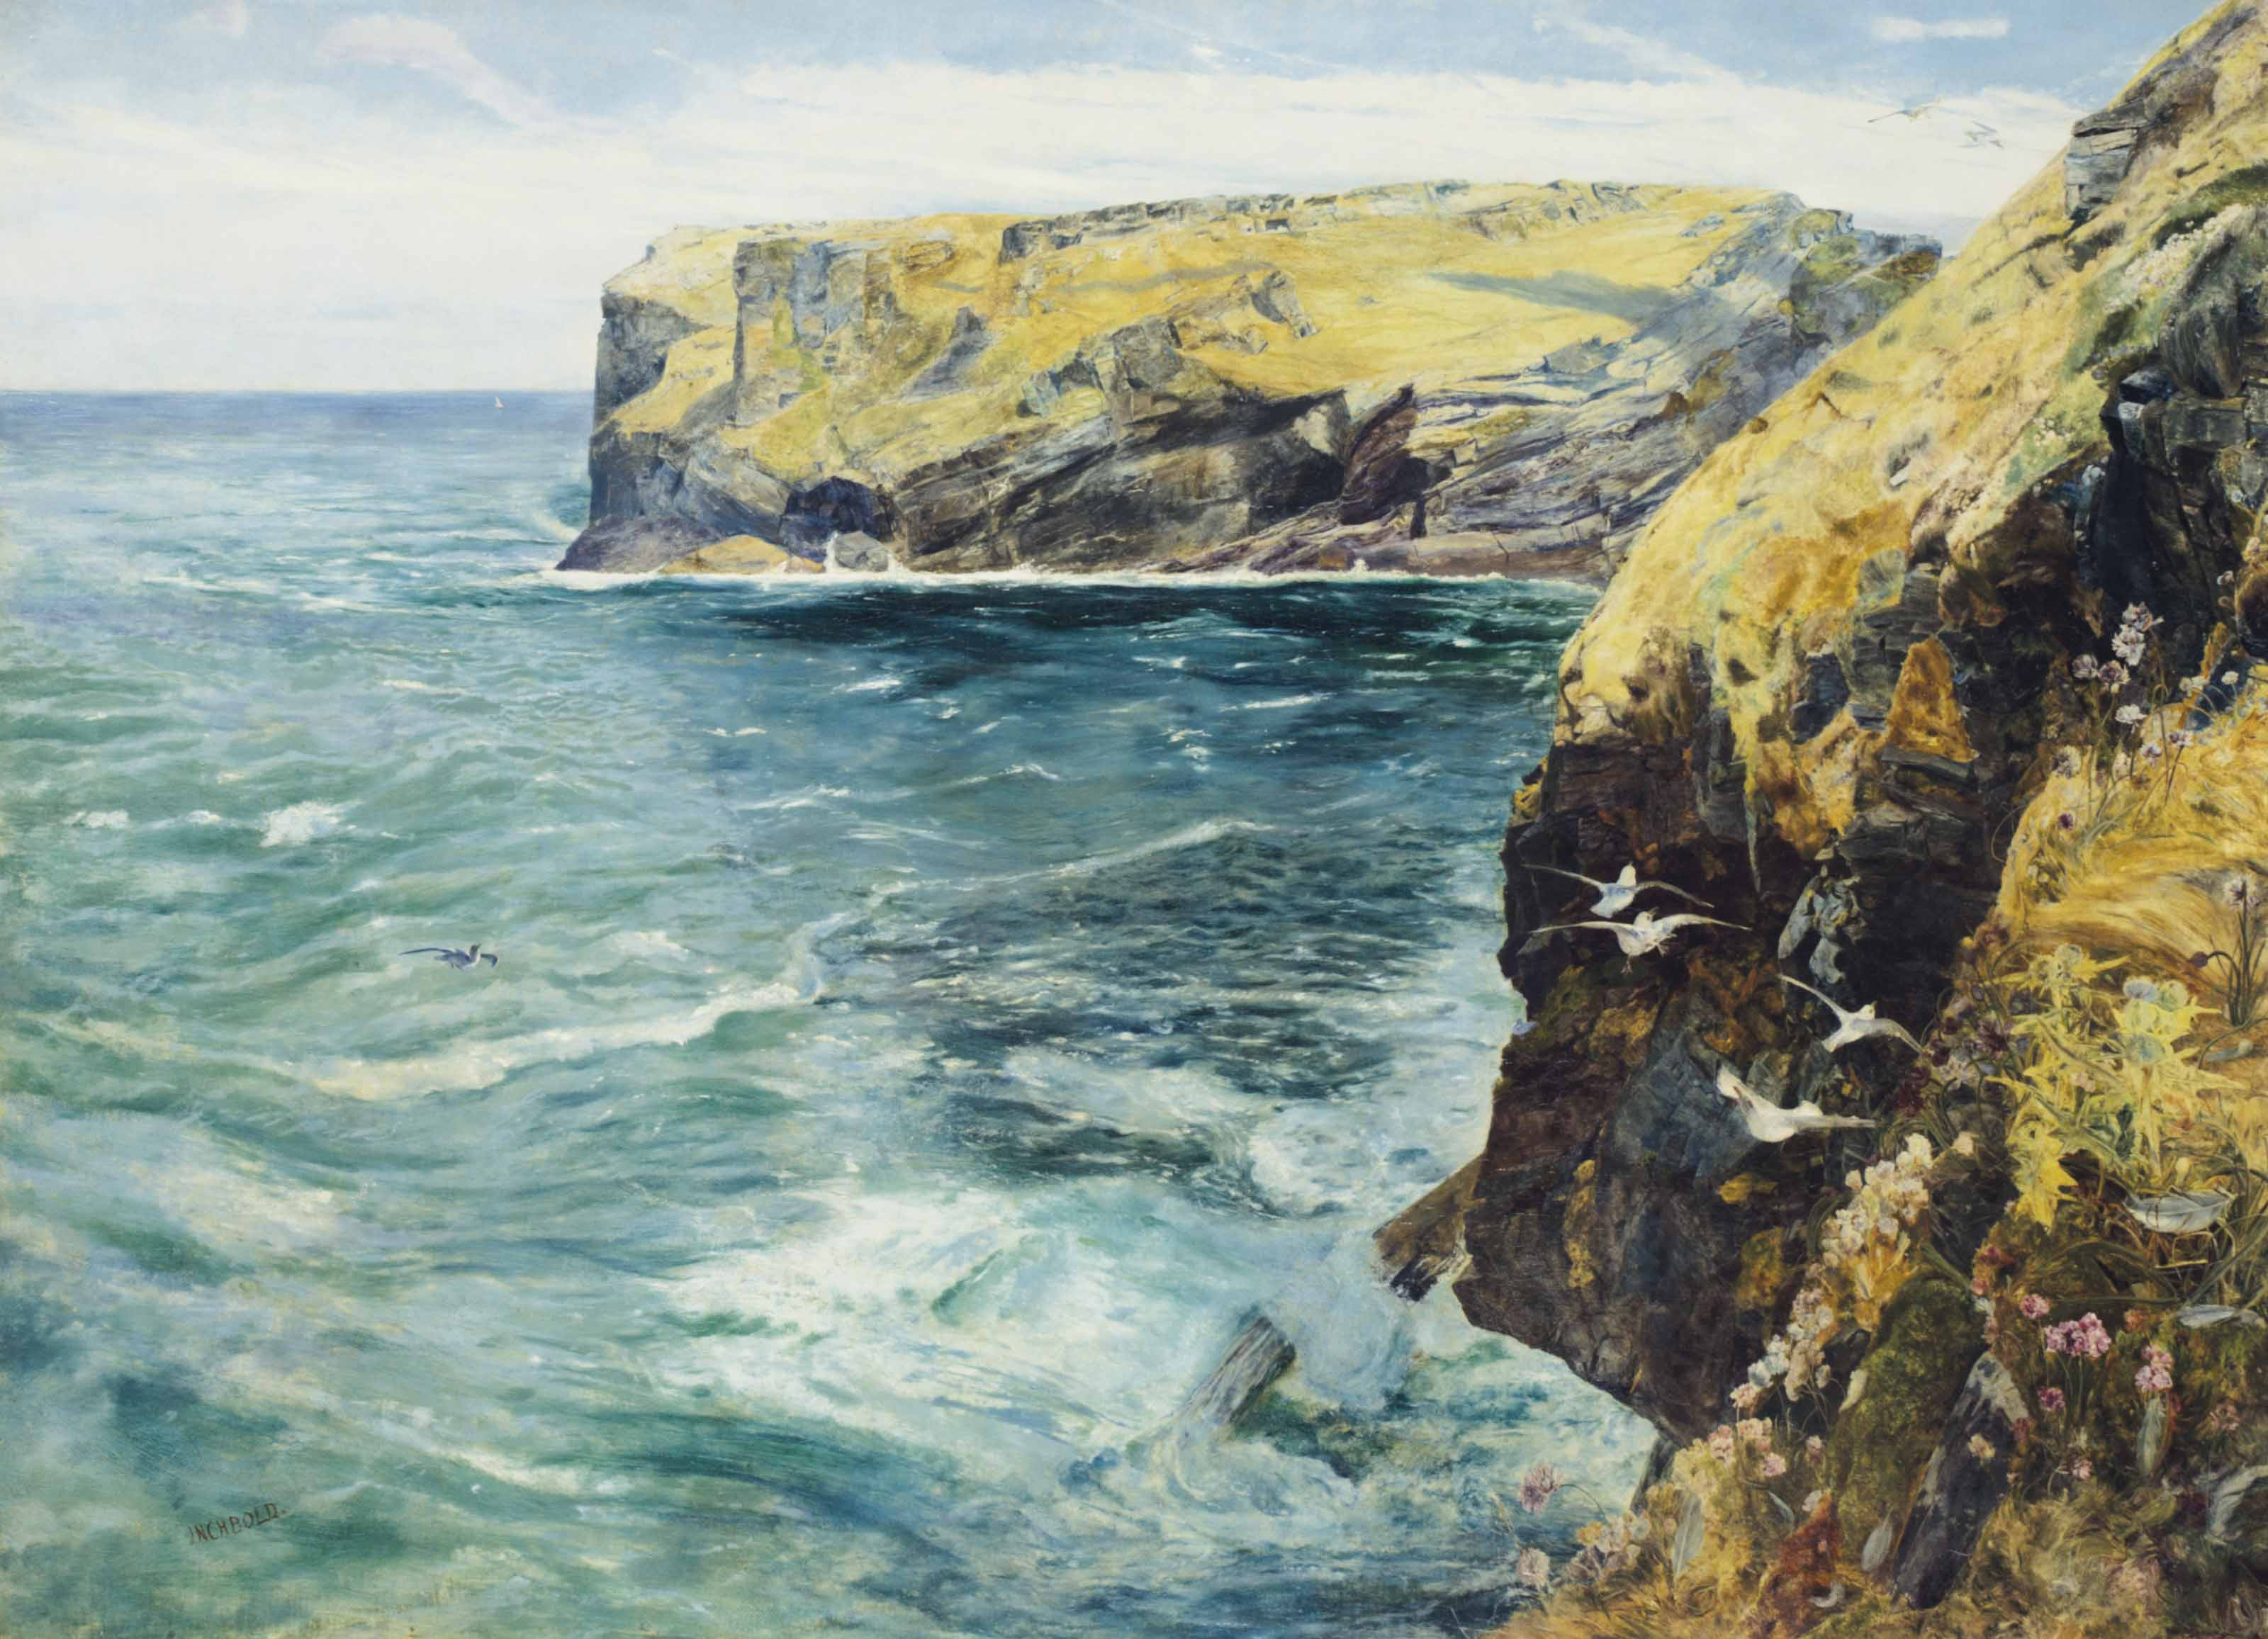 King Arthur's Island, Tintagel, Cornwall